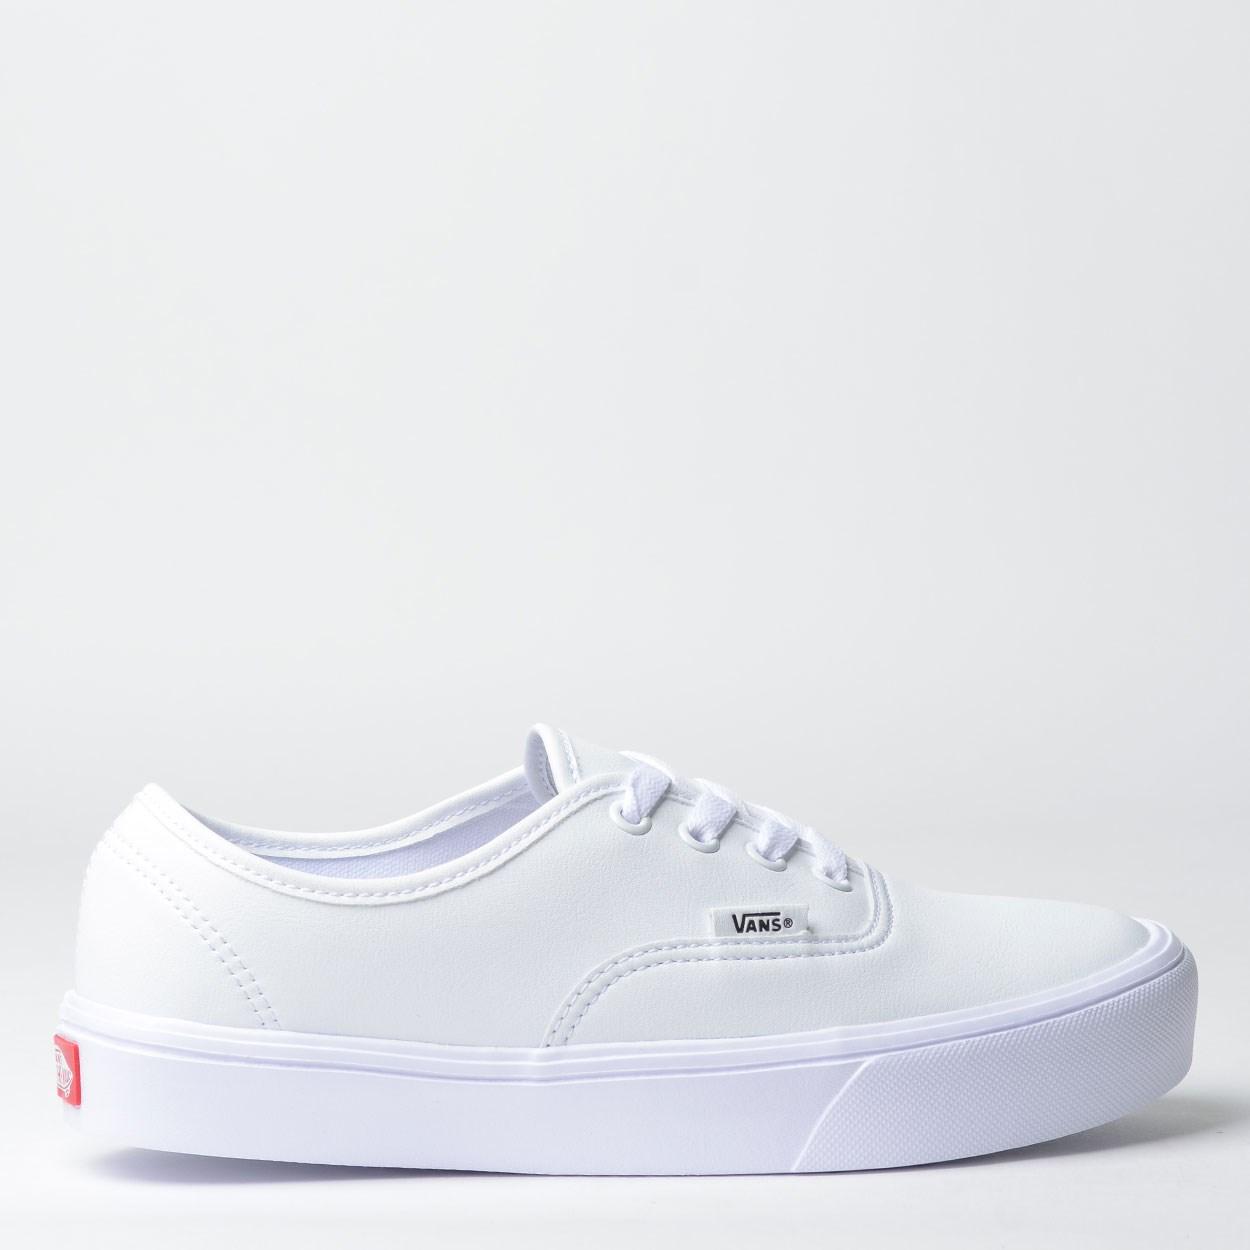 tênis vans authentic lite classic tumble true white